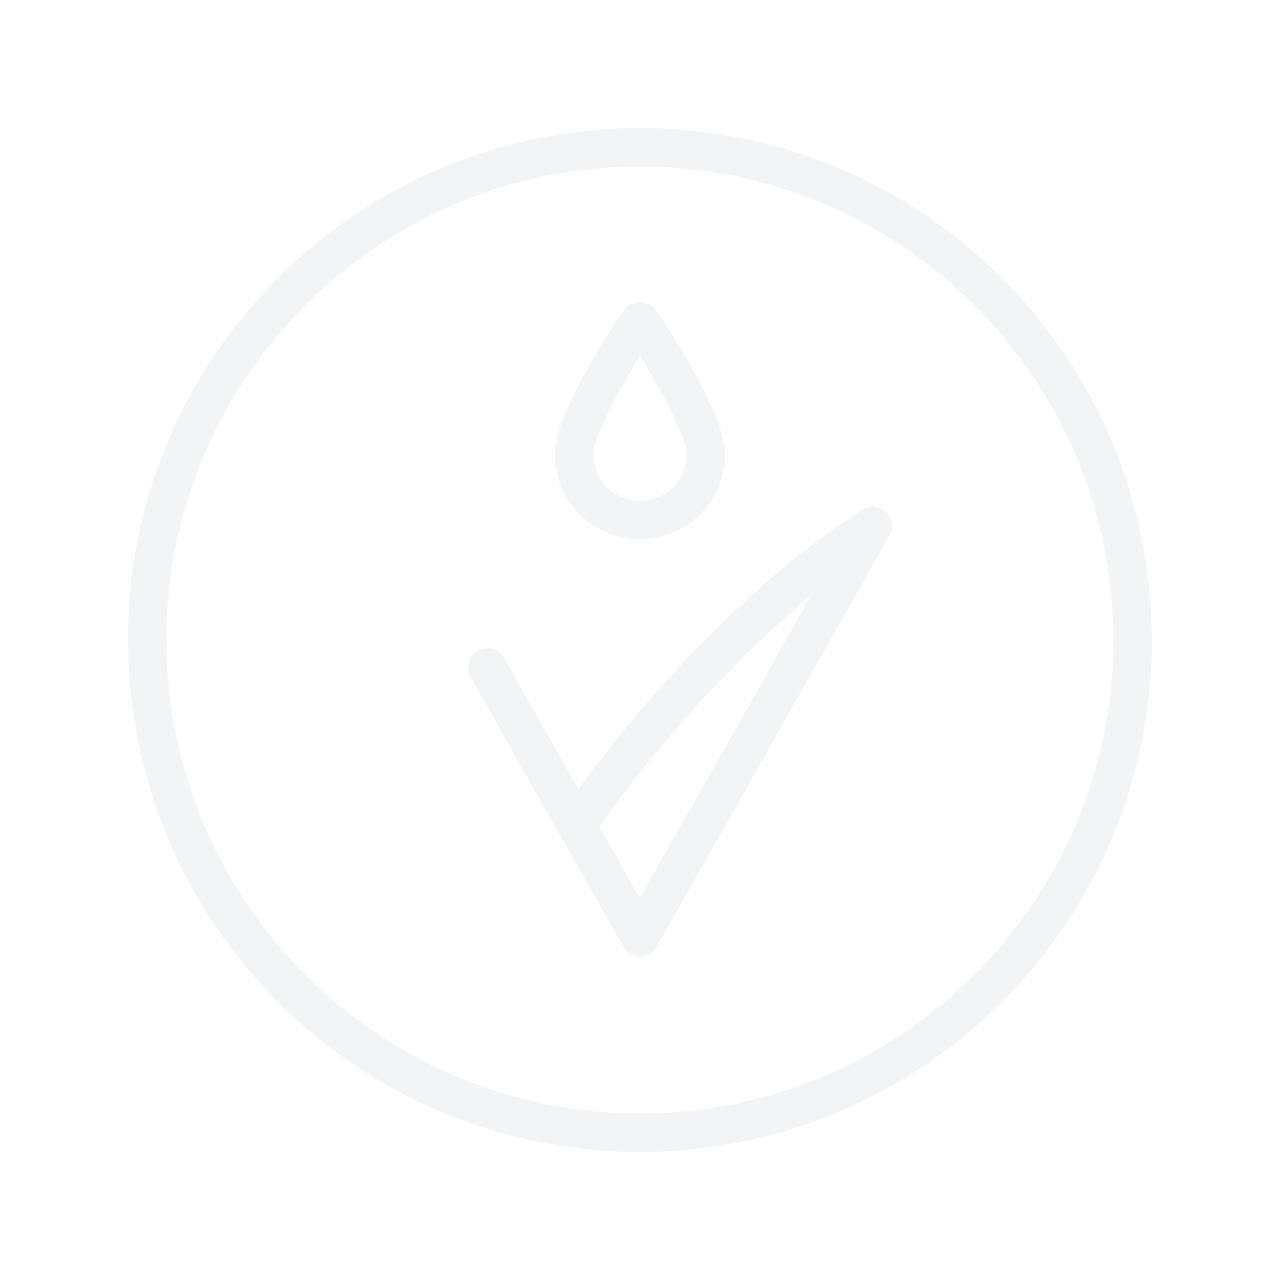 MINIGOLD Deceno Yellow Gold Ring 17.5mm